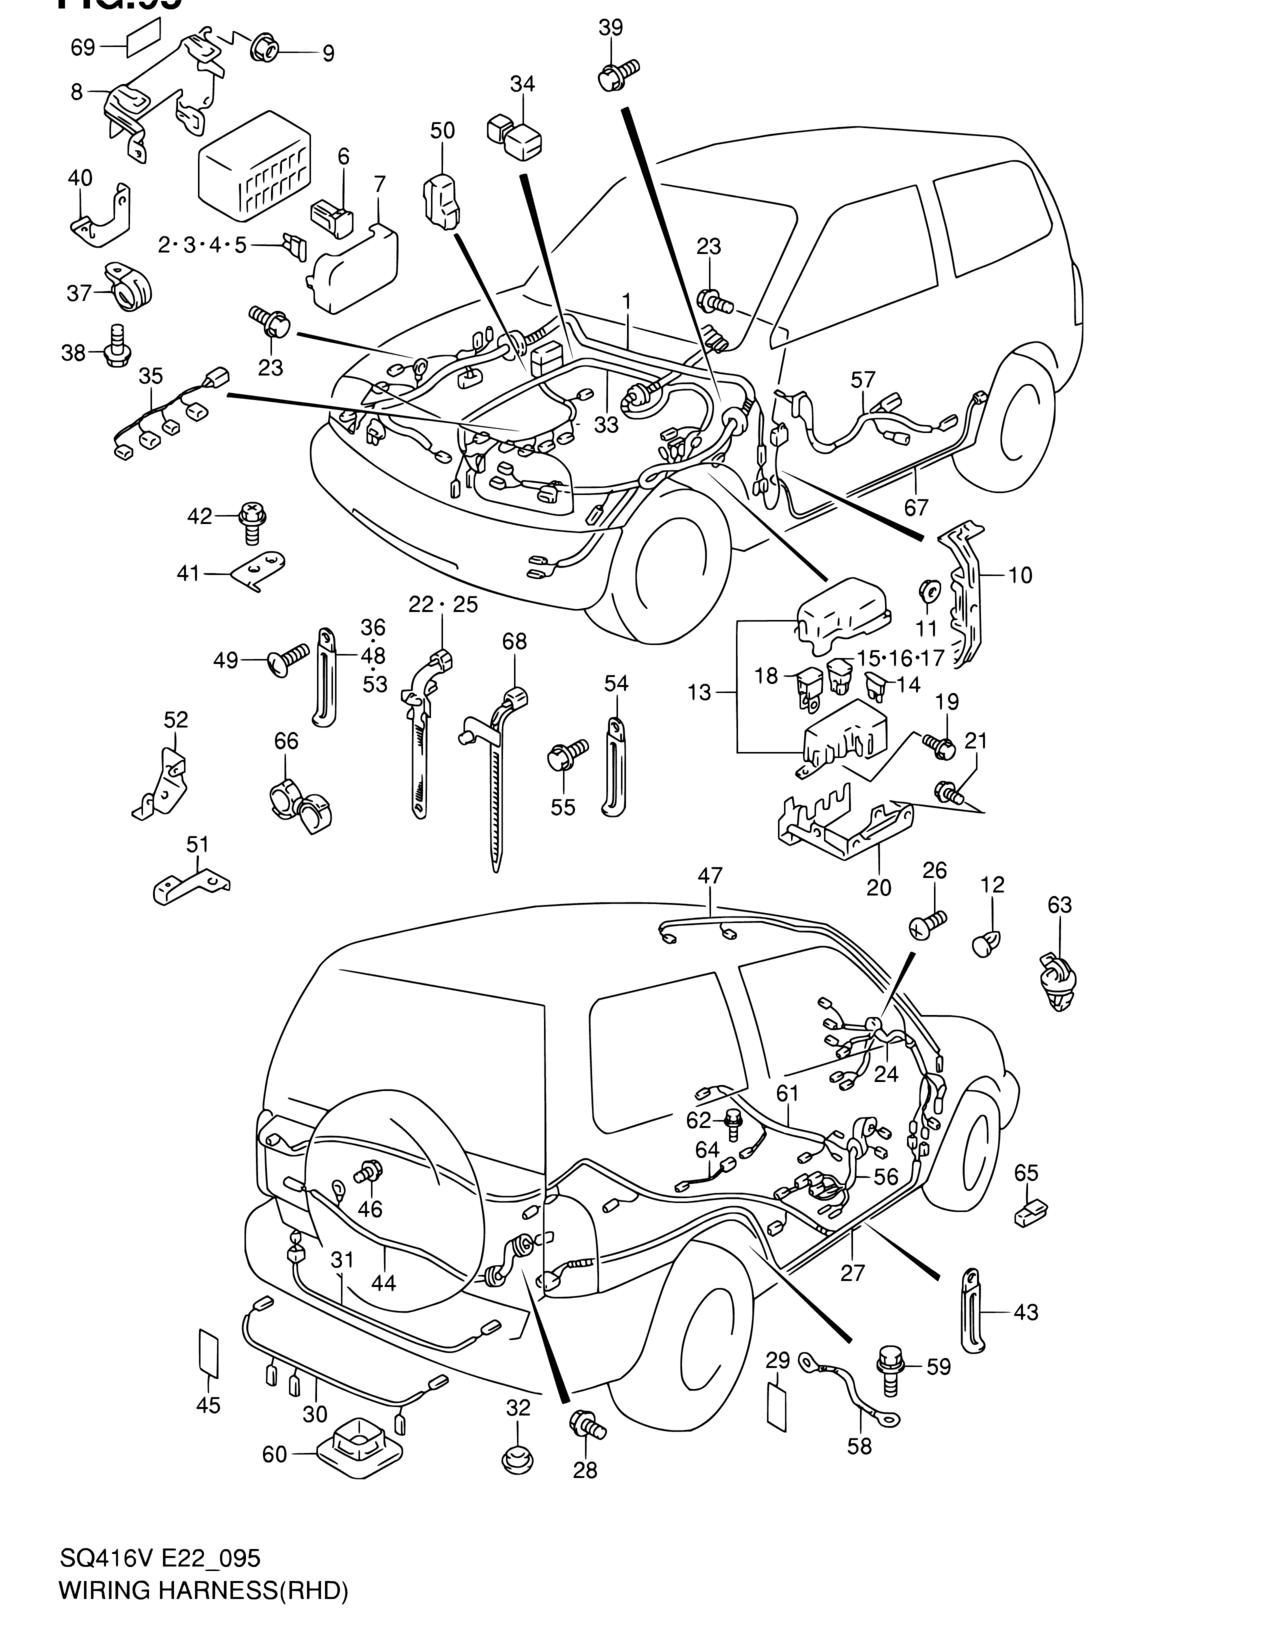 Light Fuse 1992 Suzuki Vitara Sidekick Wiring Harness Pacific Grand Electrical Rhd 1275x1650